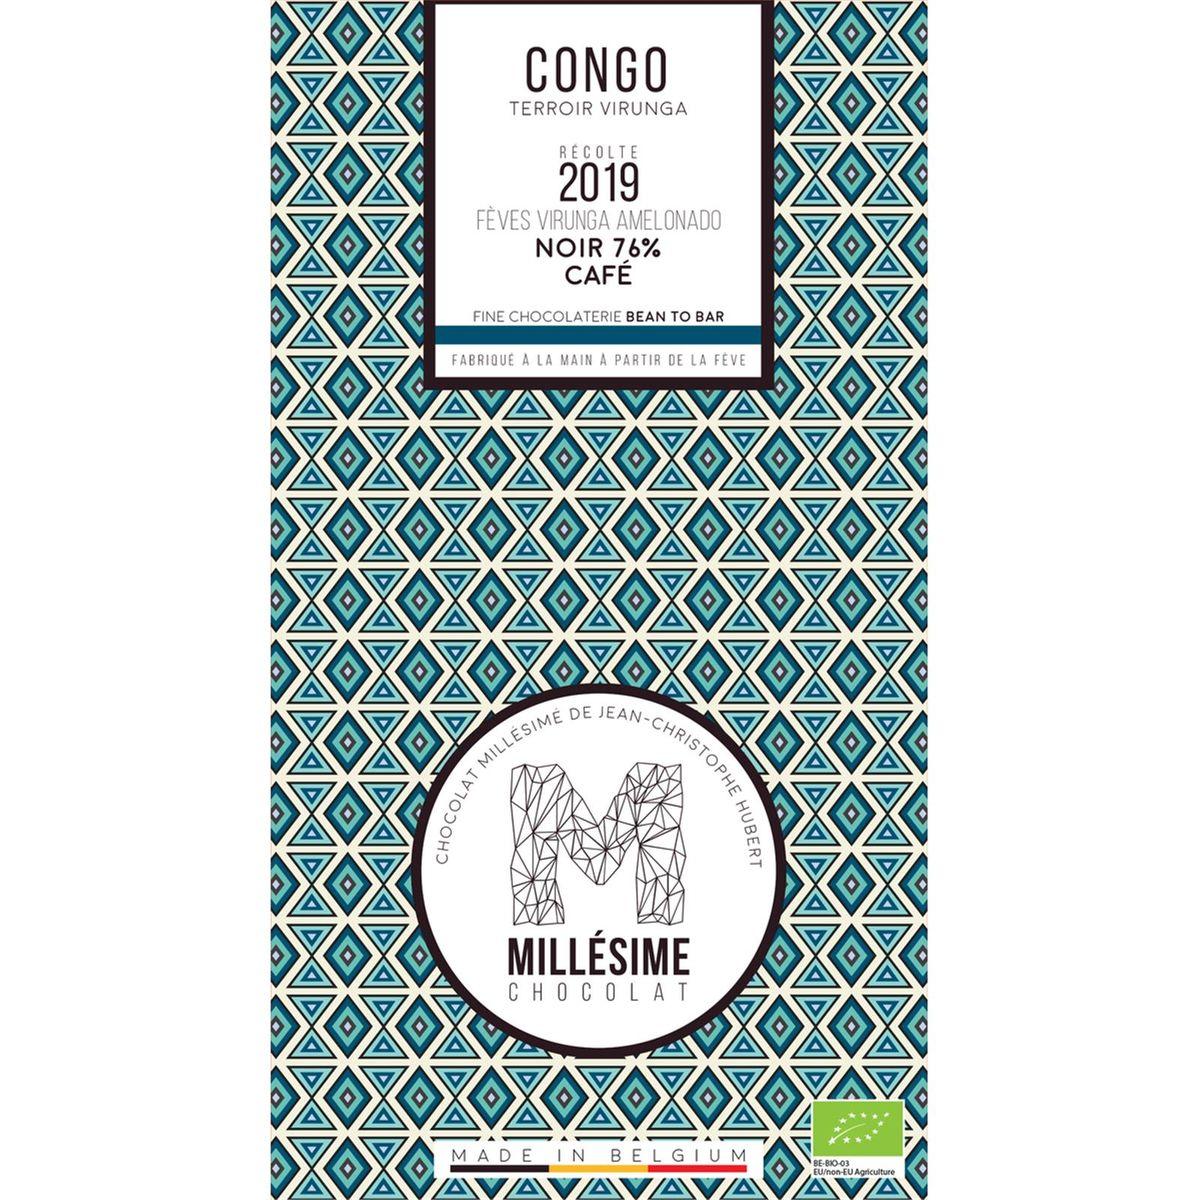 Chocolat Congo Noir 76% Café 70g - Millésime